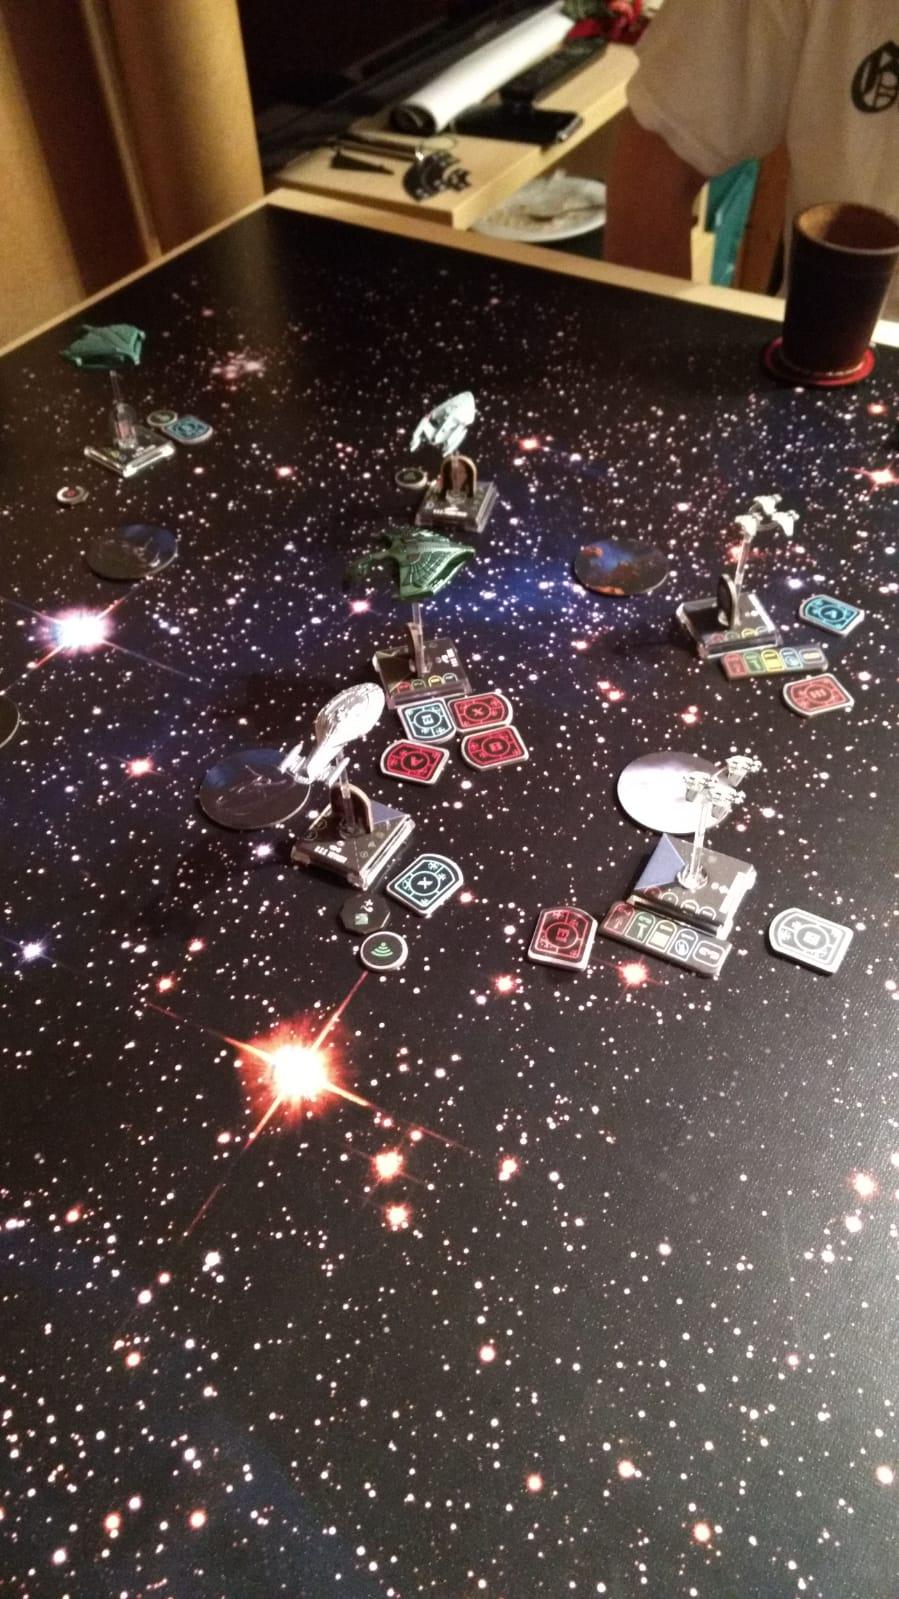 Kampf um Jouret [Föd. vs. Romulaner] Spiel710